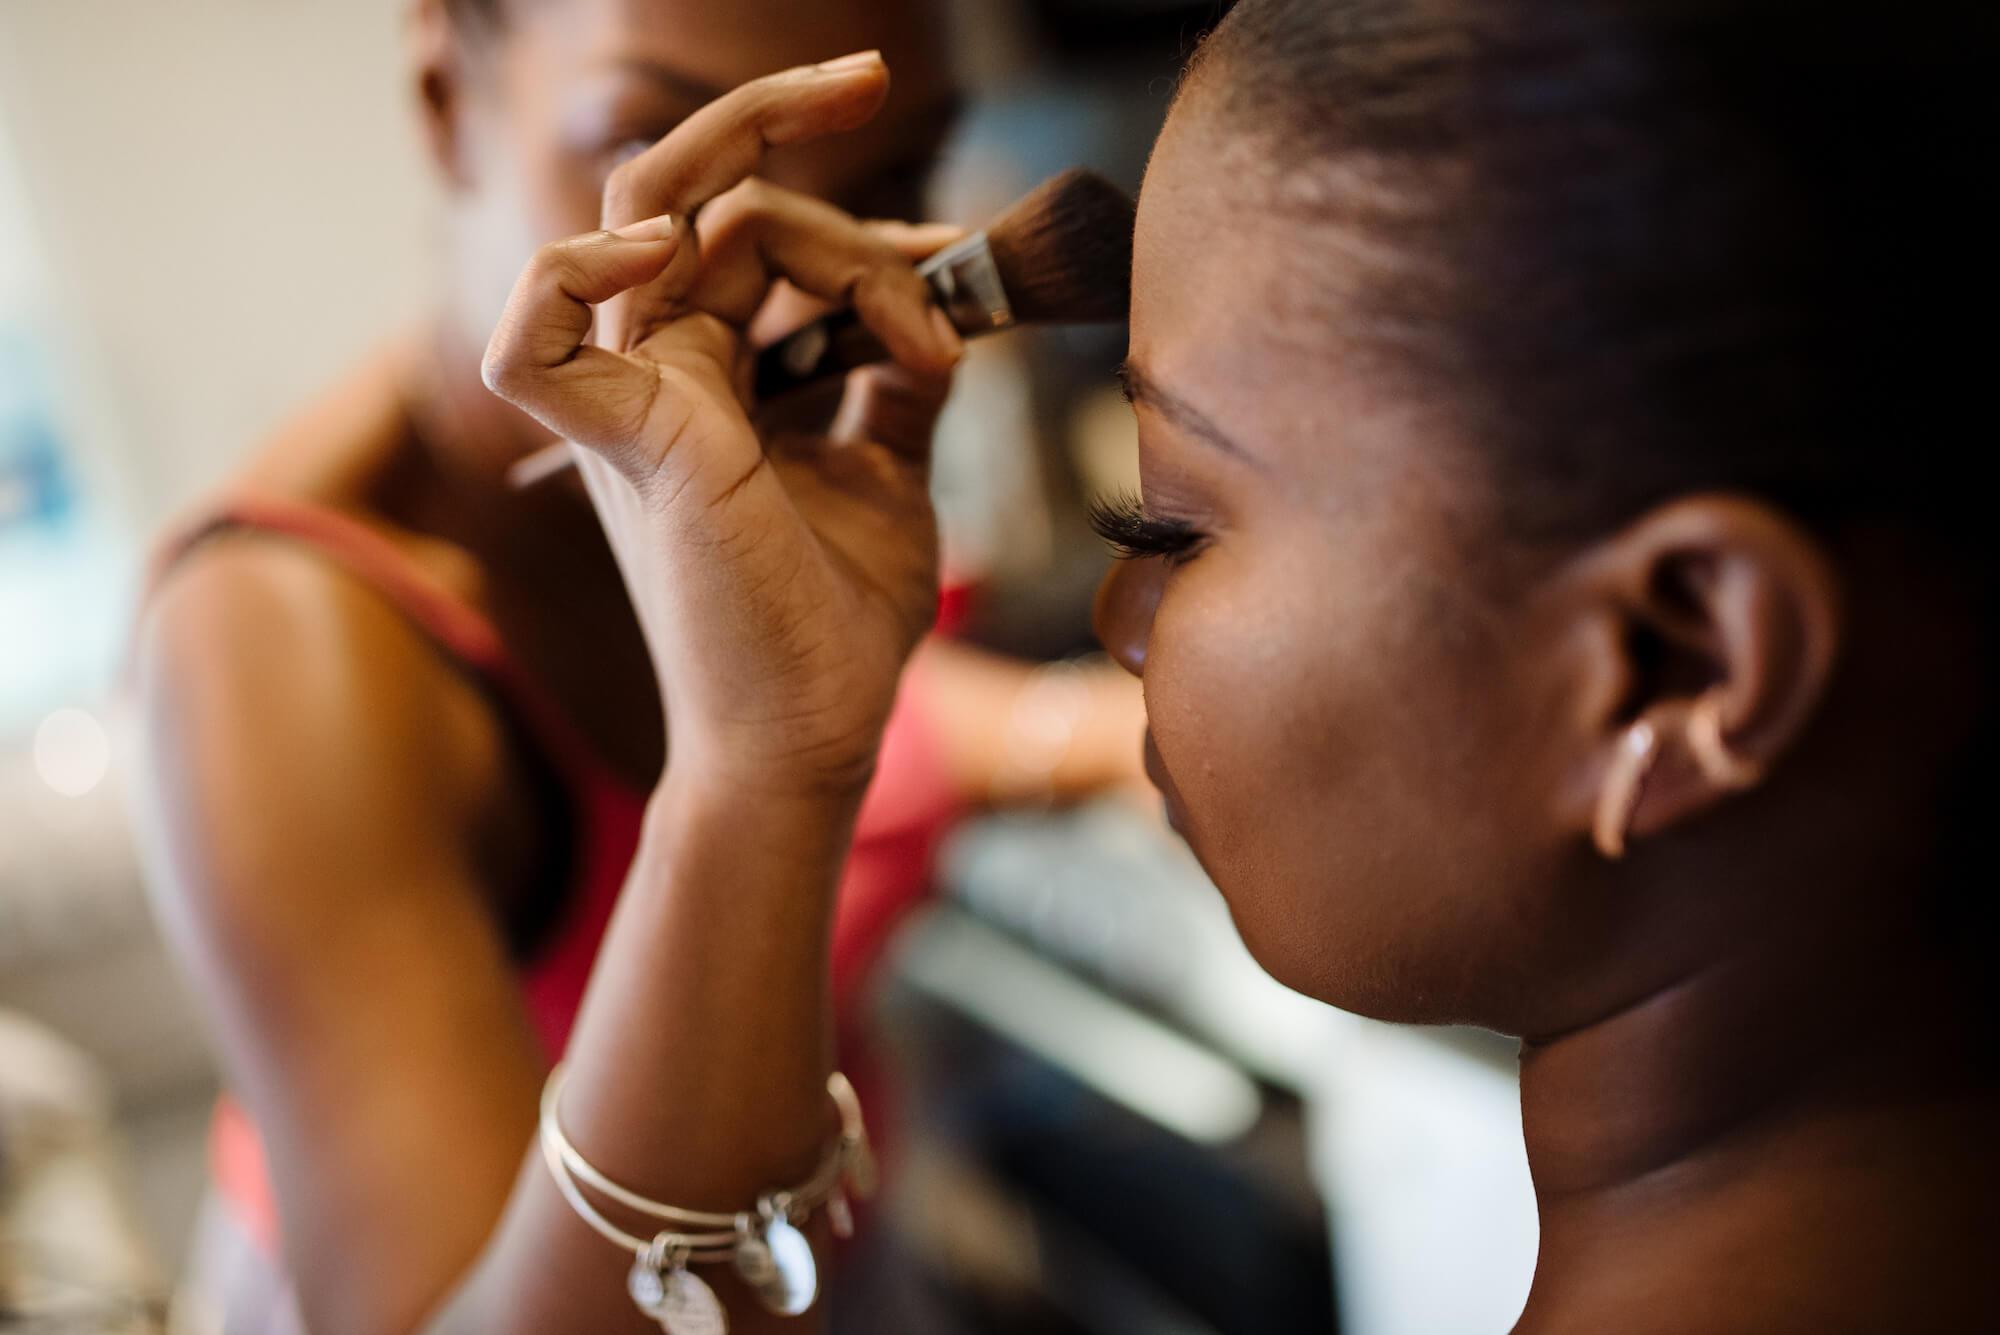 how-to-plan-a-destination-wedding-my-wedding-recap-ivory-perkins-beauty-12.jpg